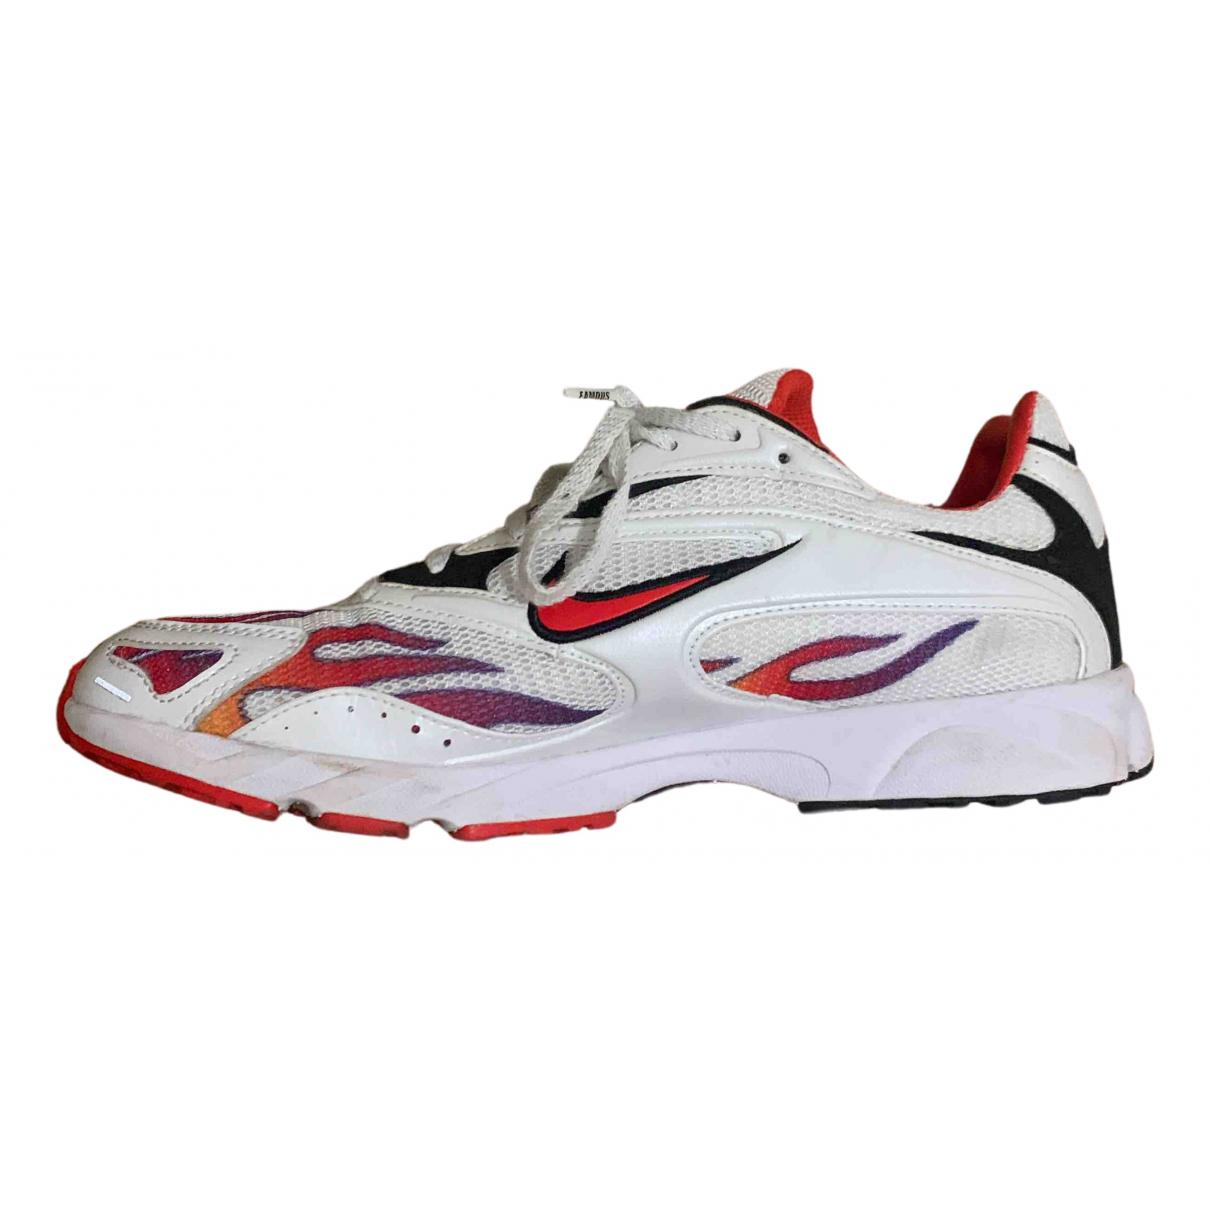 Nike X Supreme Zoom Streak Spectrum Plus Sneakers in  Bunt Leinen